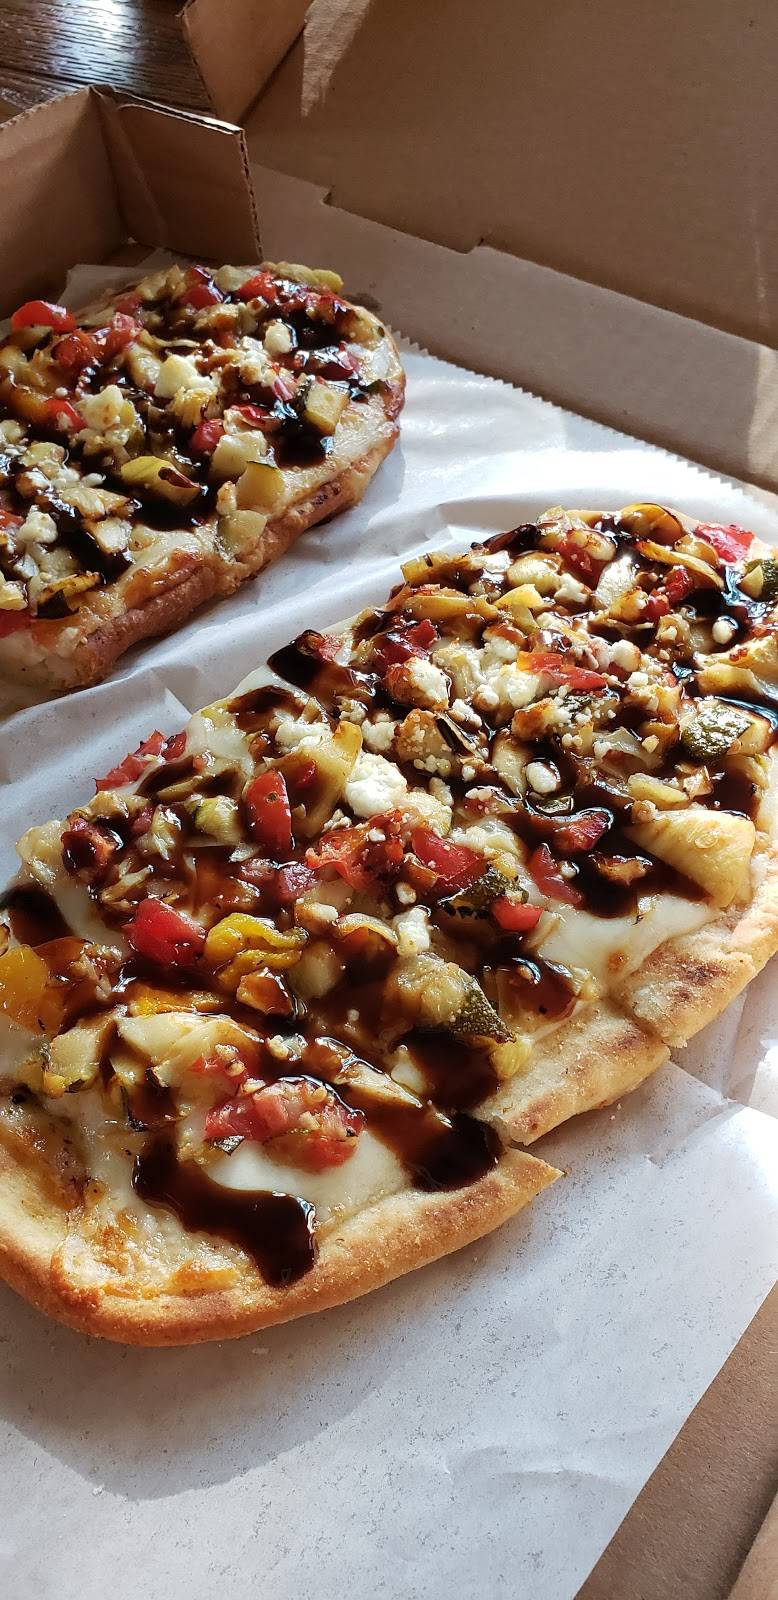 RAGU NY PIZZA & ITALIAN KITCHEN | restaurant | 2490 MD-97, Glenwood, MD 21738, USA | 4104895800 OR +1 410-489-5800